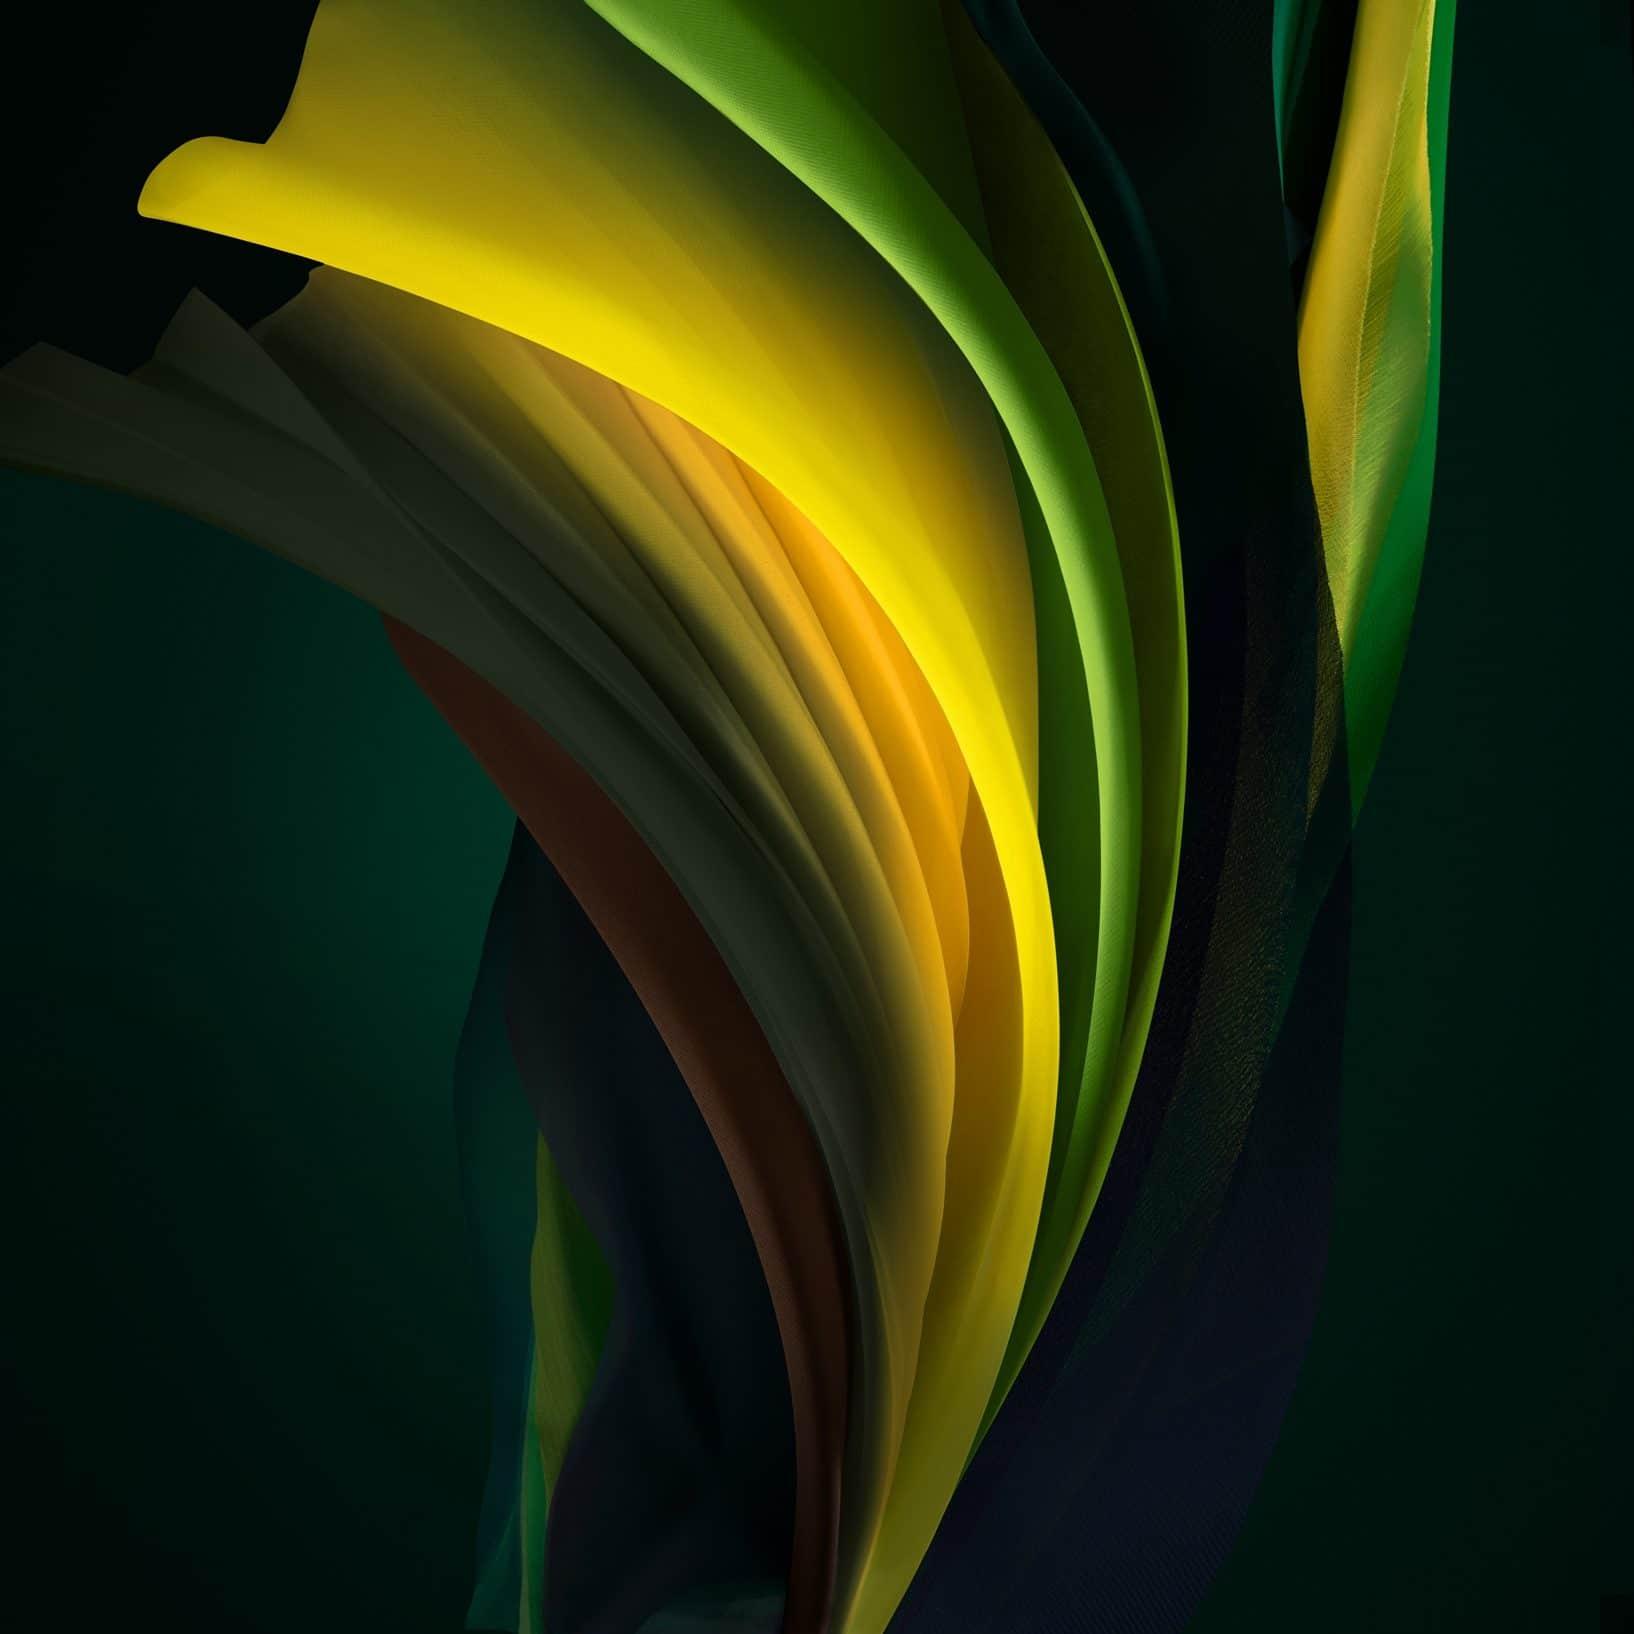 Silk Green Dark iPhone SE 2 Wallpaper